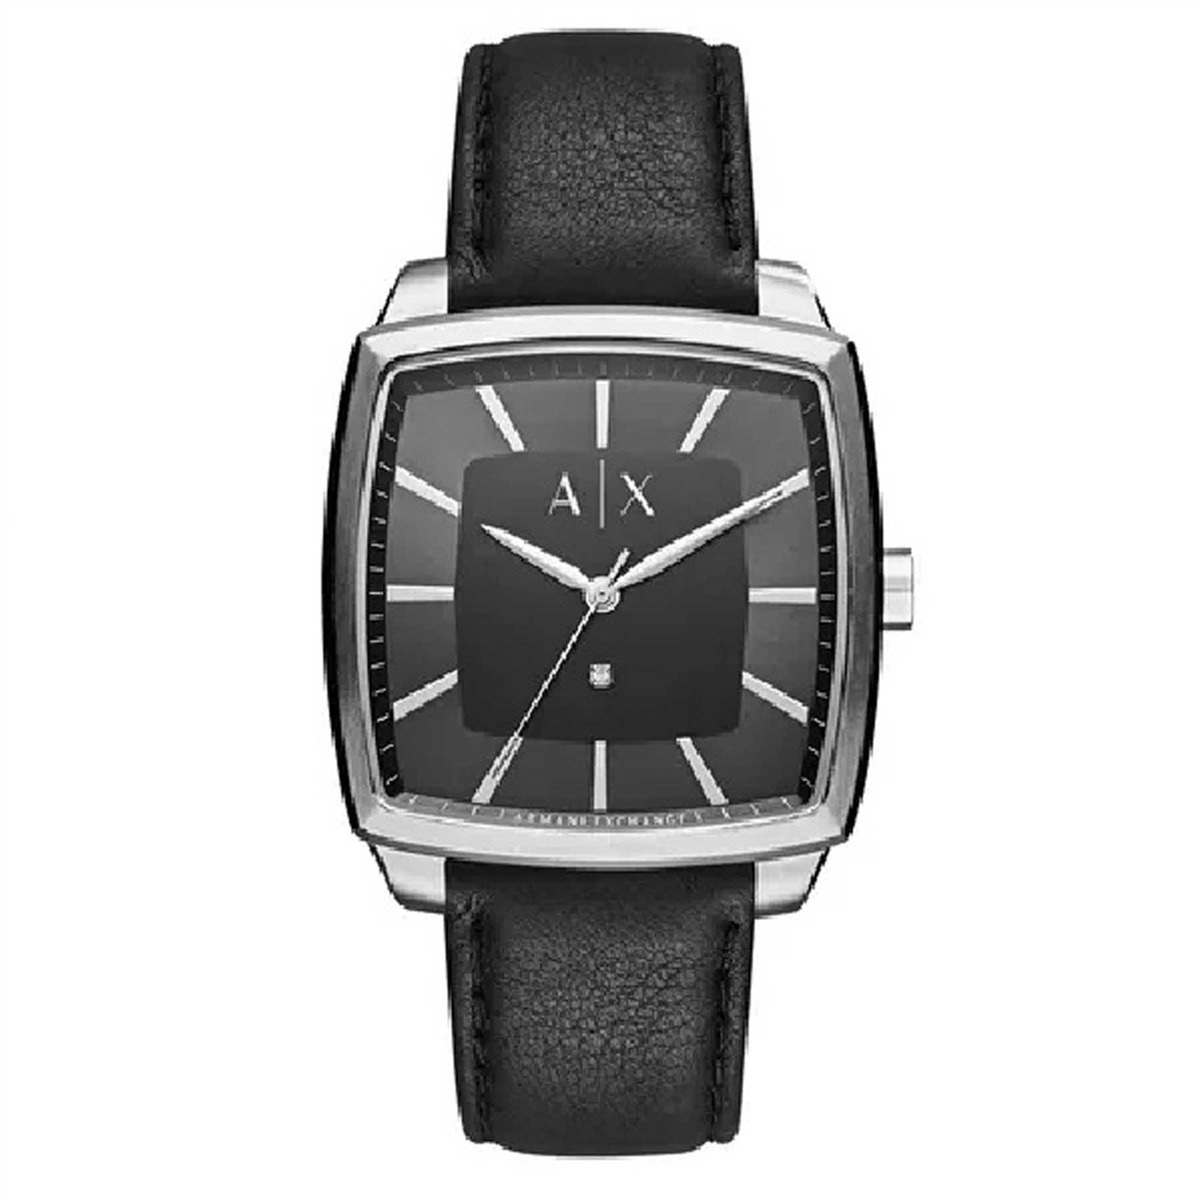 cce5c2a497d Relógio Armani Exchange Analógico Masculino Ax2362 0pn - R  899